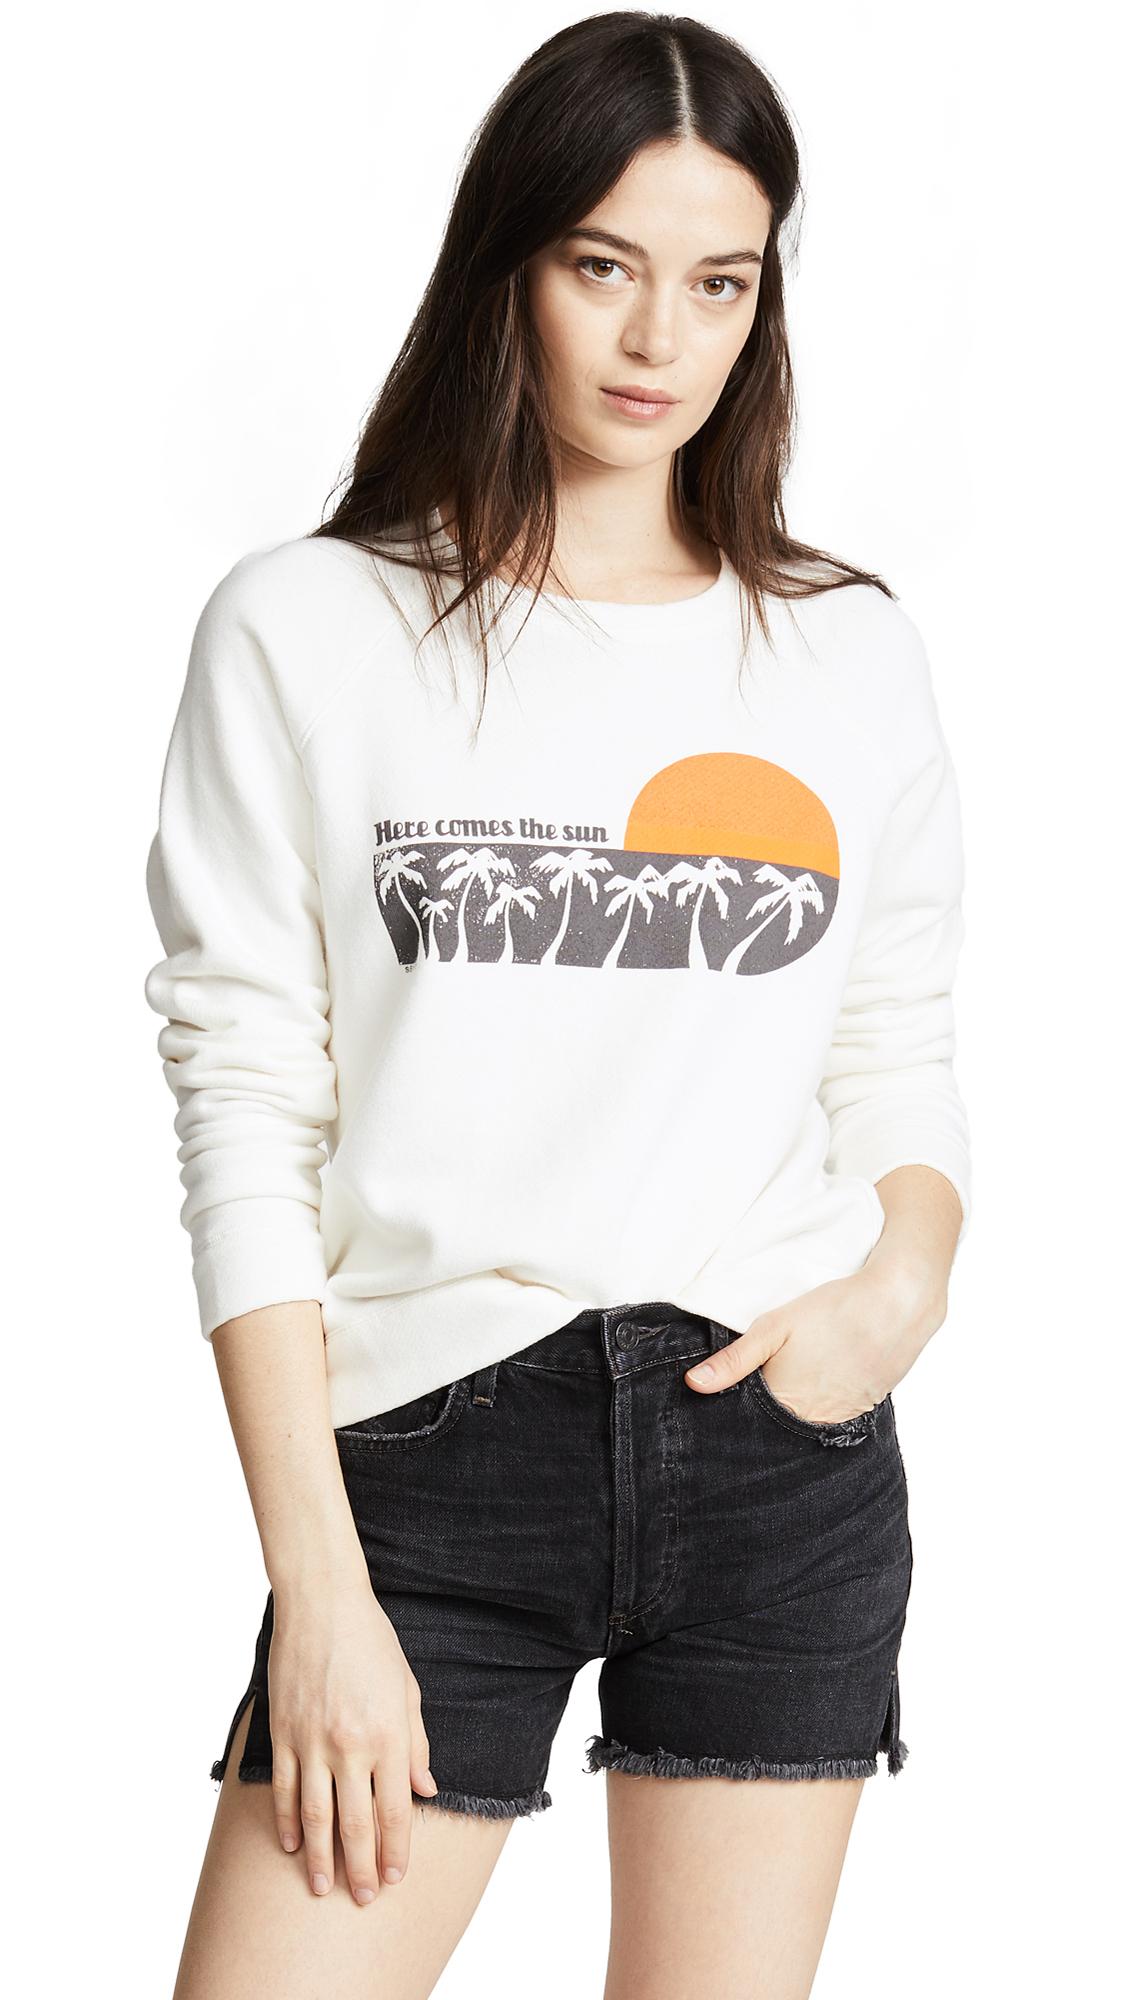 Sea Here Comes The Sun Sweatshirt In White